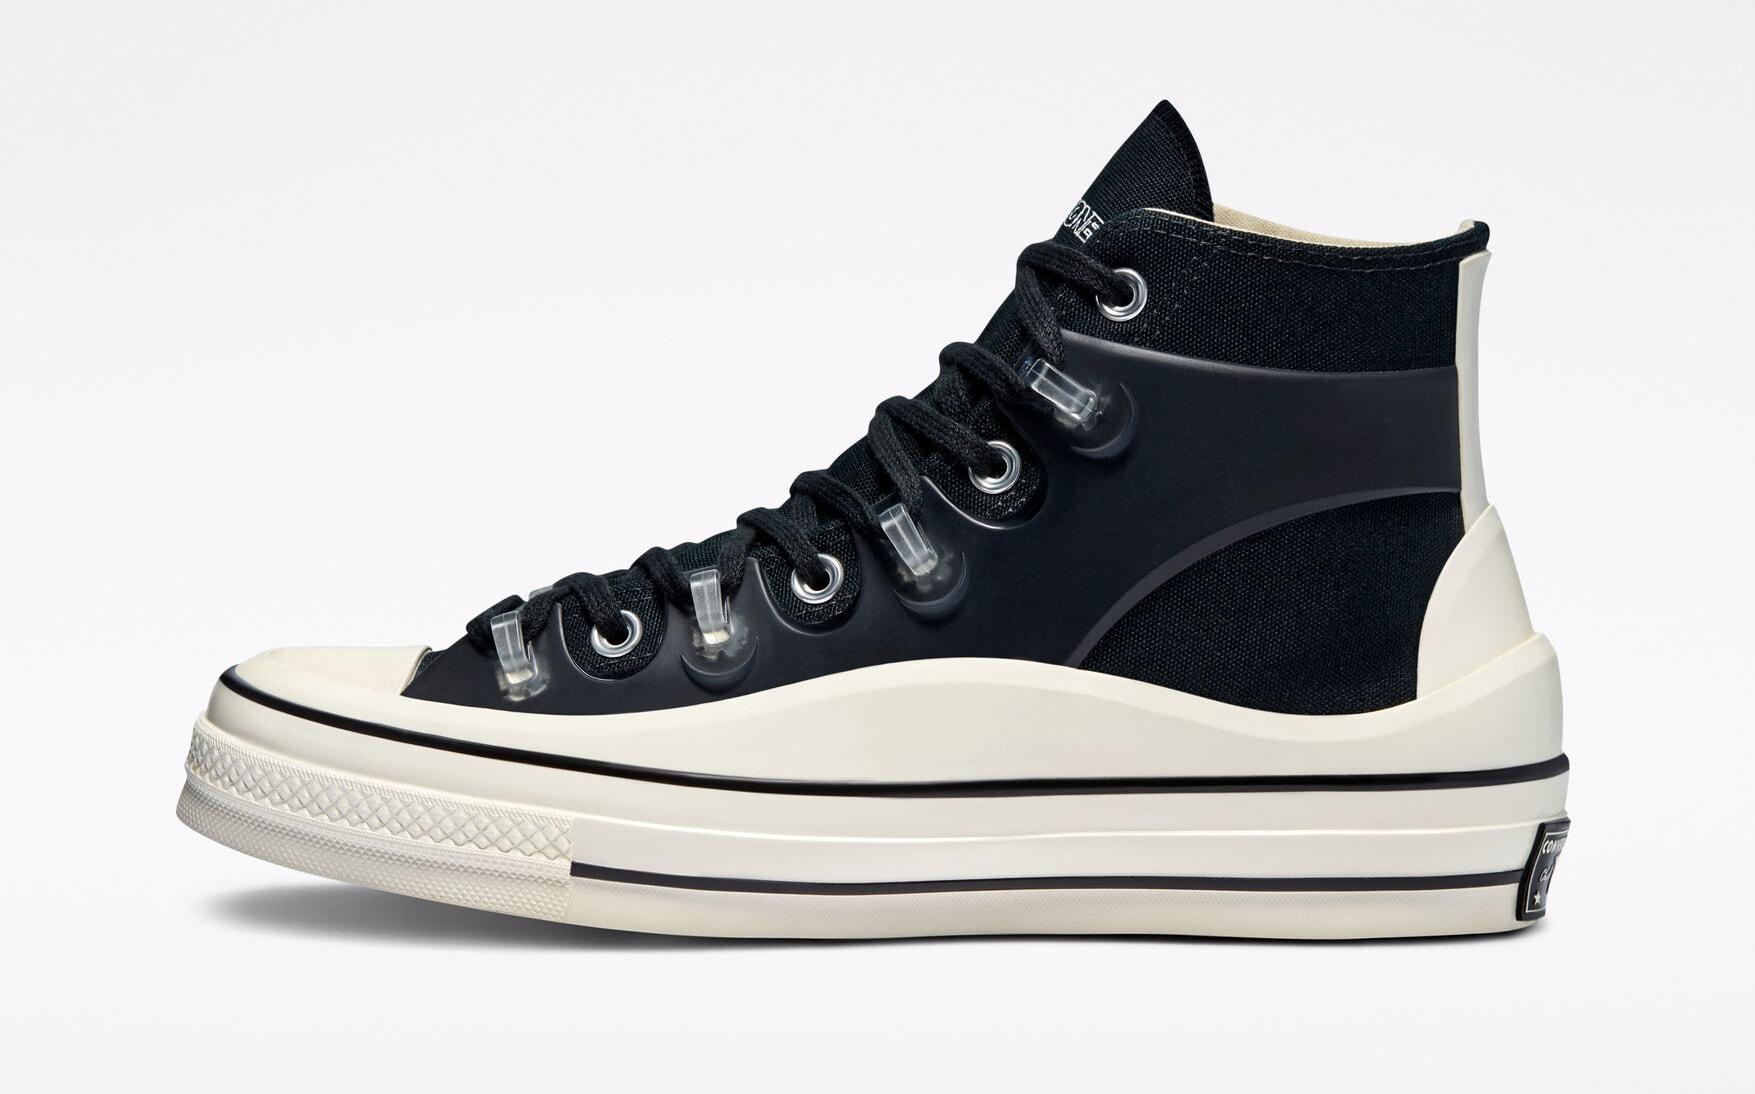 Kim Jones x Converse Chuck 70 'Black' 171257C Lateral